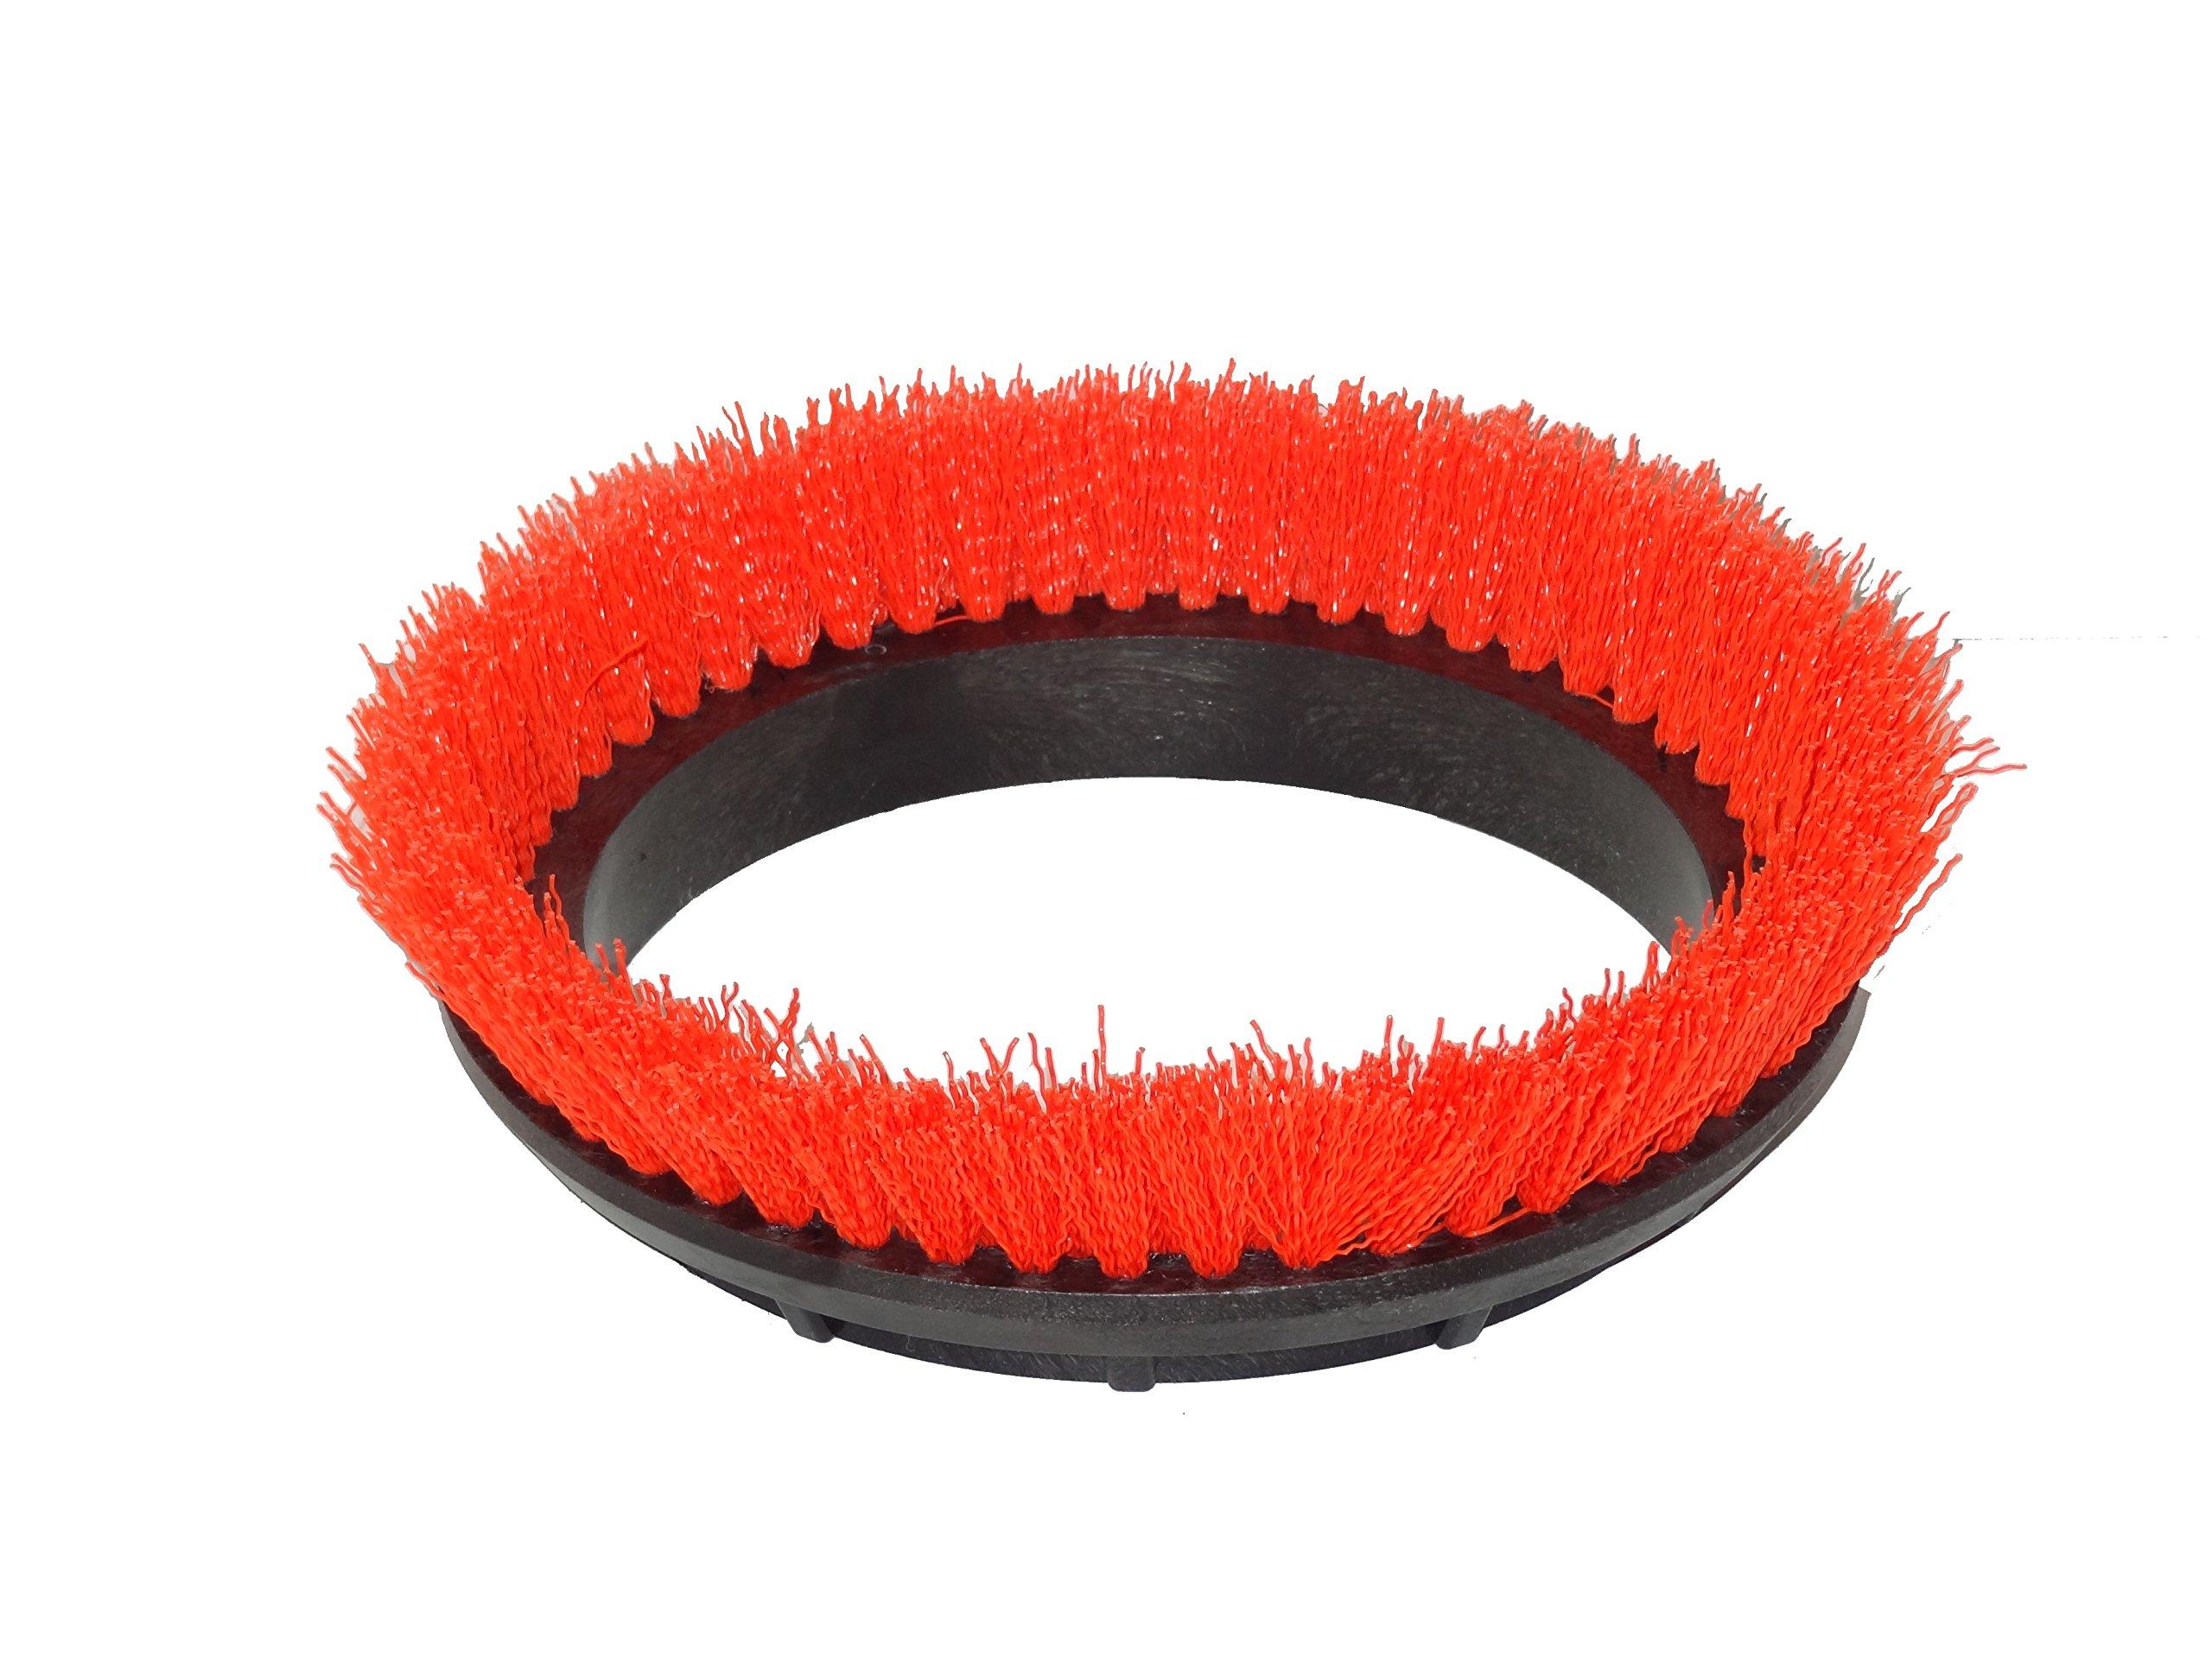 BISSELL BigGreen Commercial 237.047BG Scrub Brush, 0.028'' Bristle Diameter Crimped Polypropylene for BGEM9000 Easy Motion Floor Machine, 12'', Orange